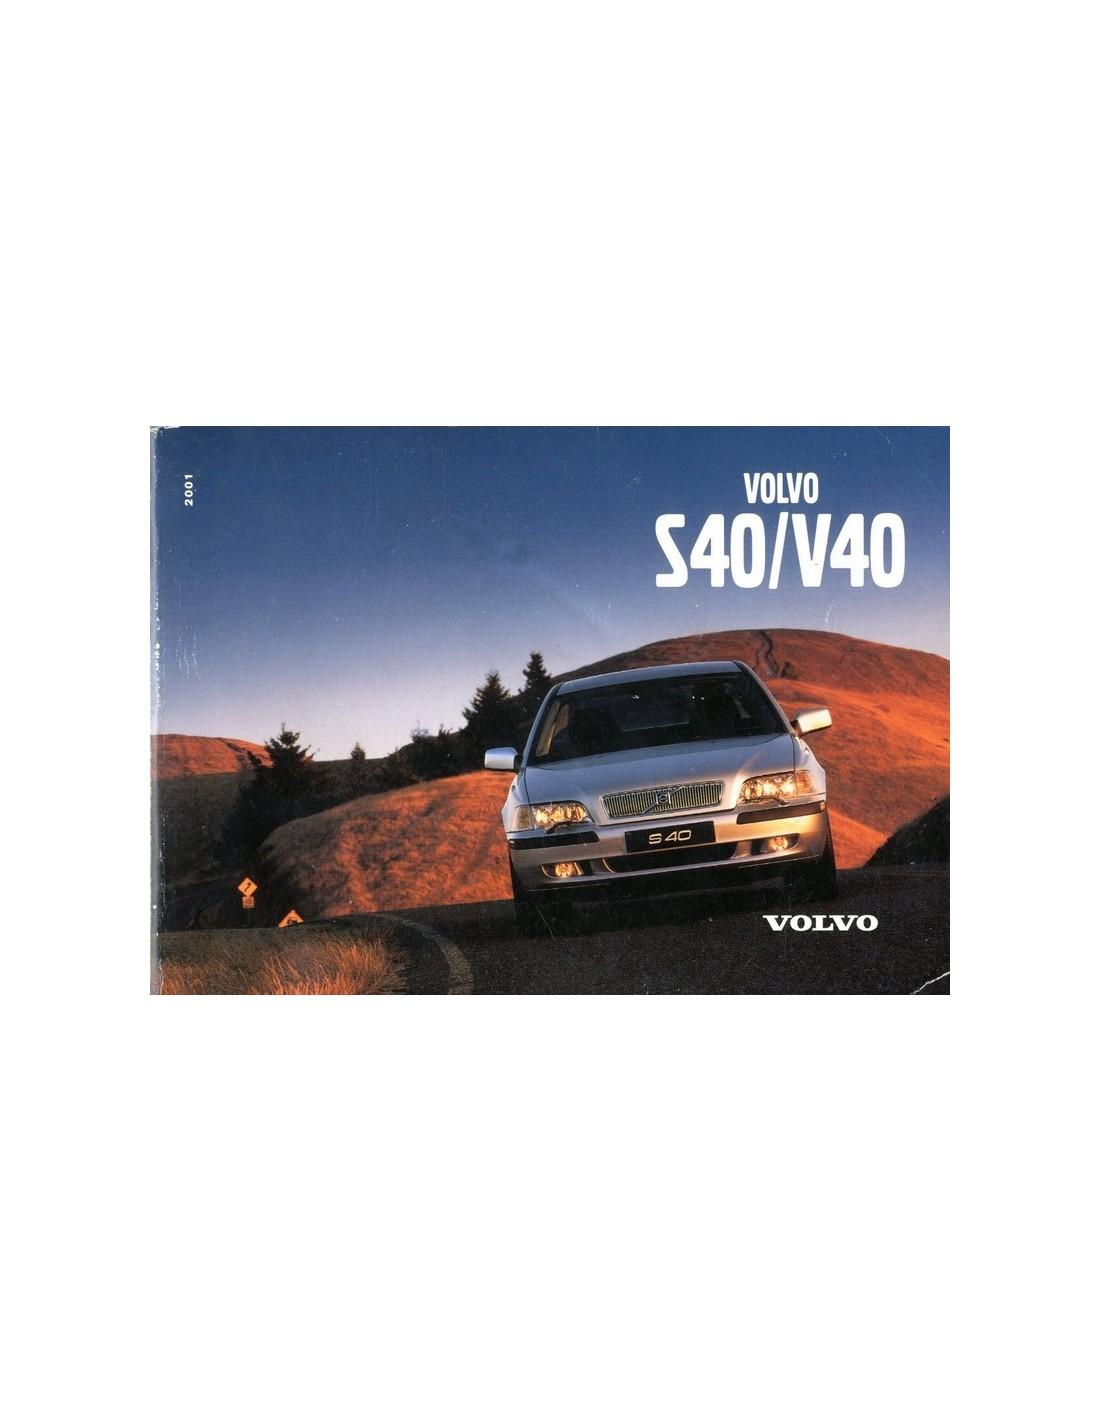 volvo s40 2006 owners manual pdf download autos post Mitsubishi Montero Engine Manual 2007 Mitsubishi Fuso FE84D